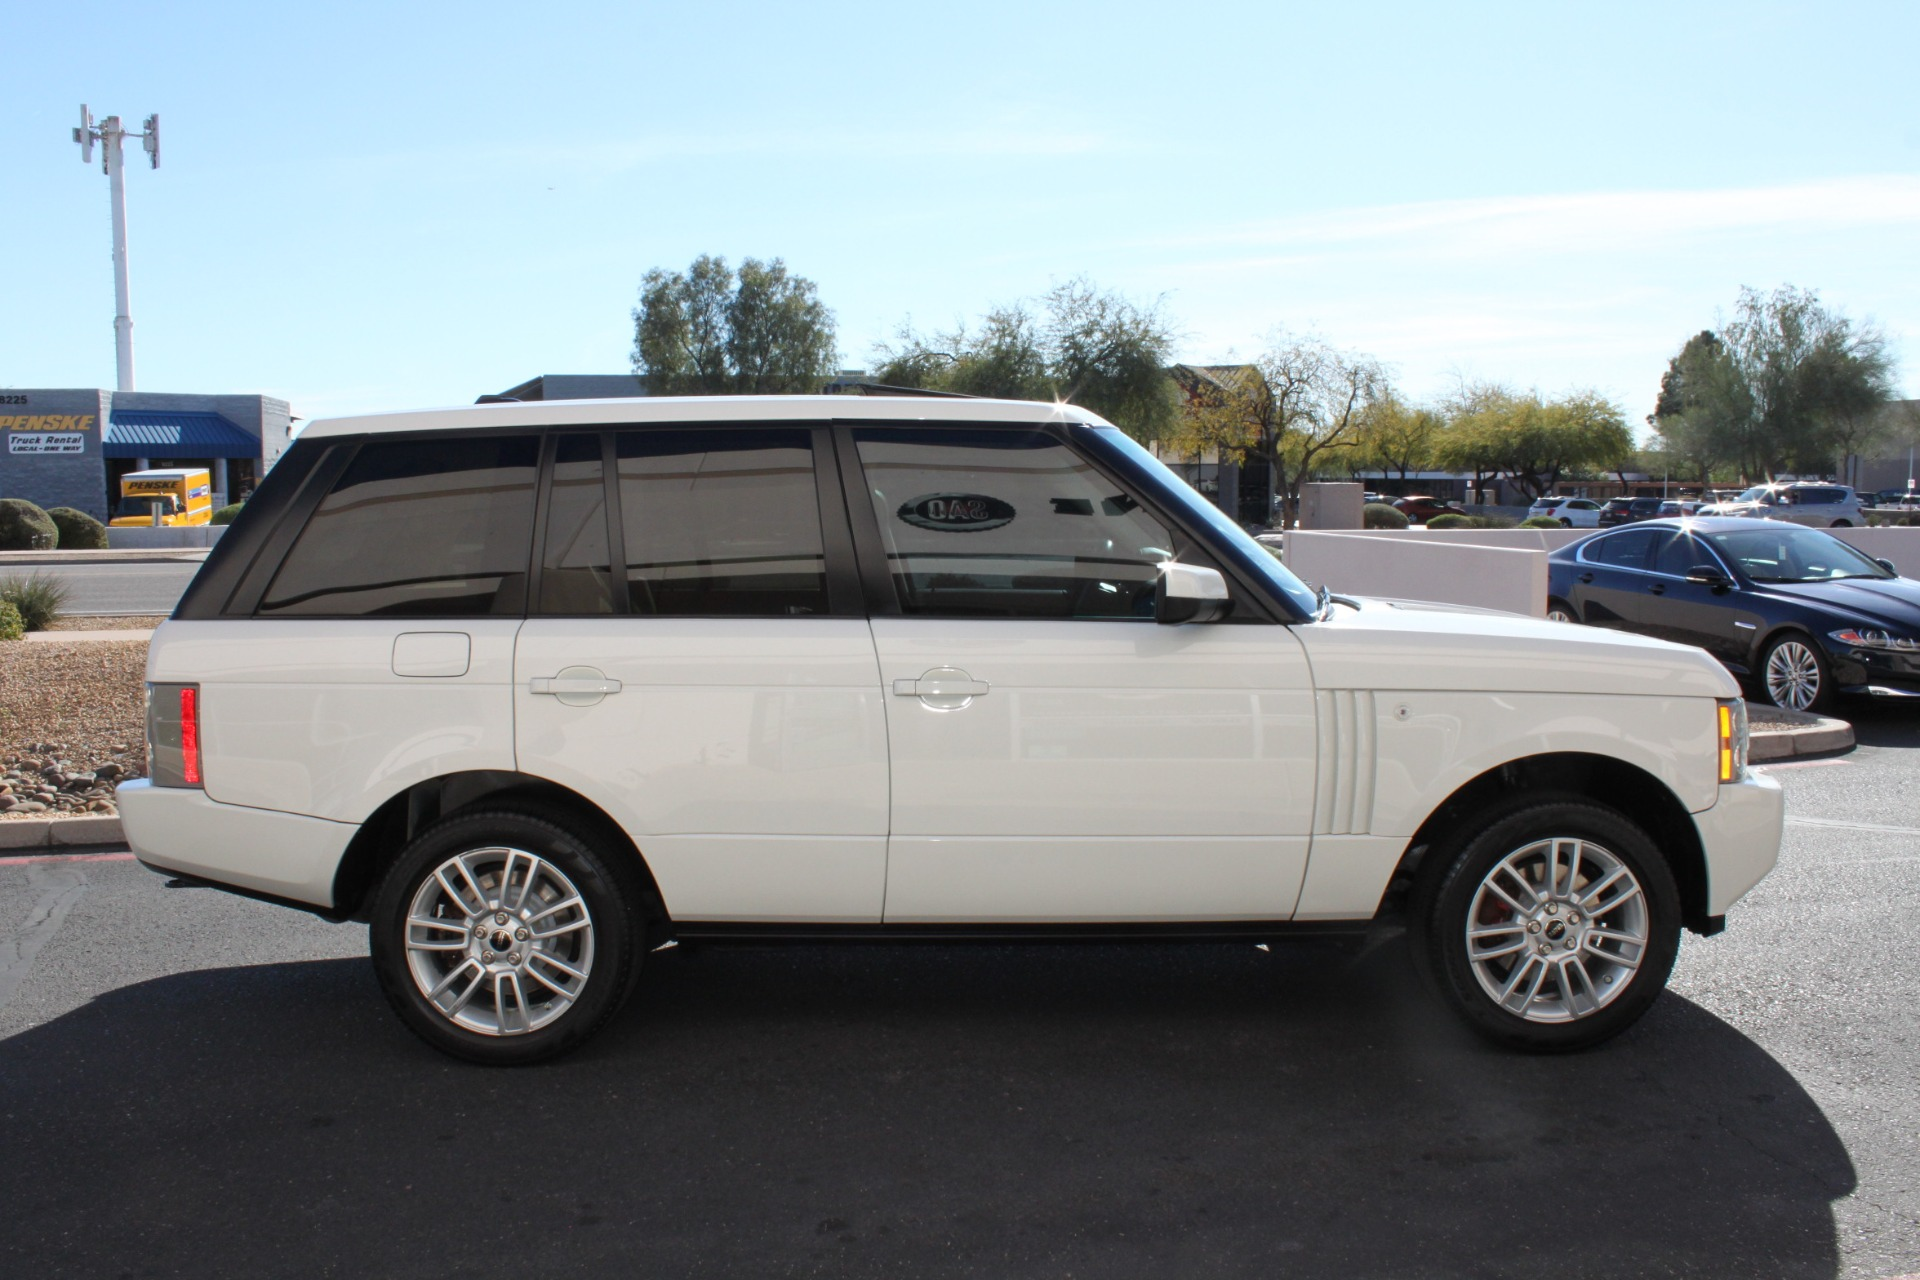 Used-2007-Land-Rover-Range-Rover-HSE-Chrysler